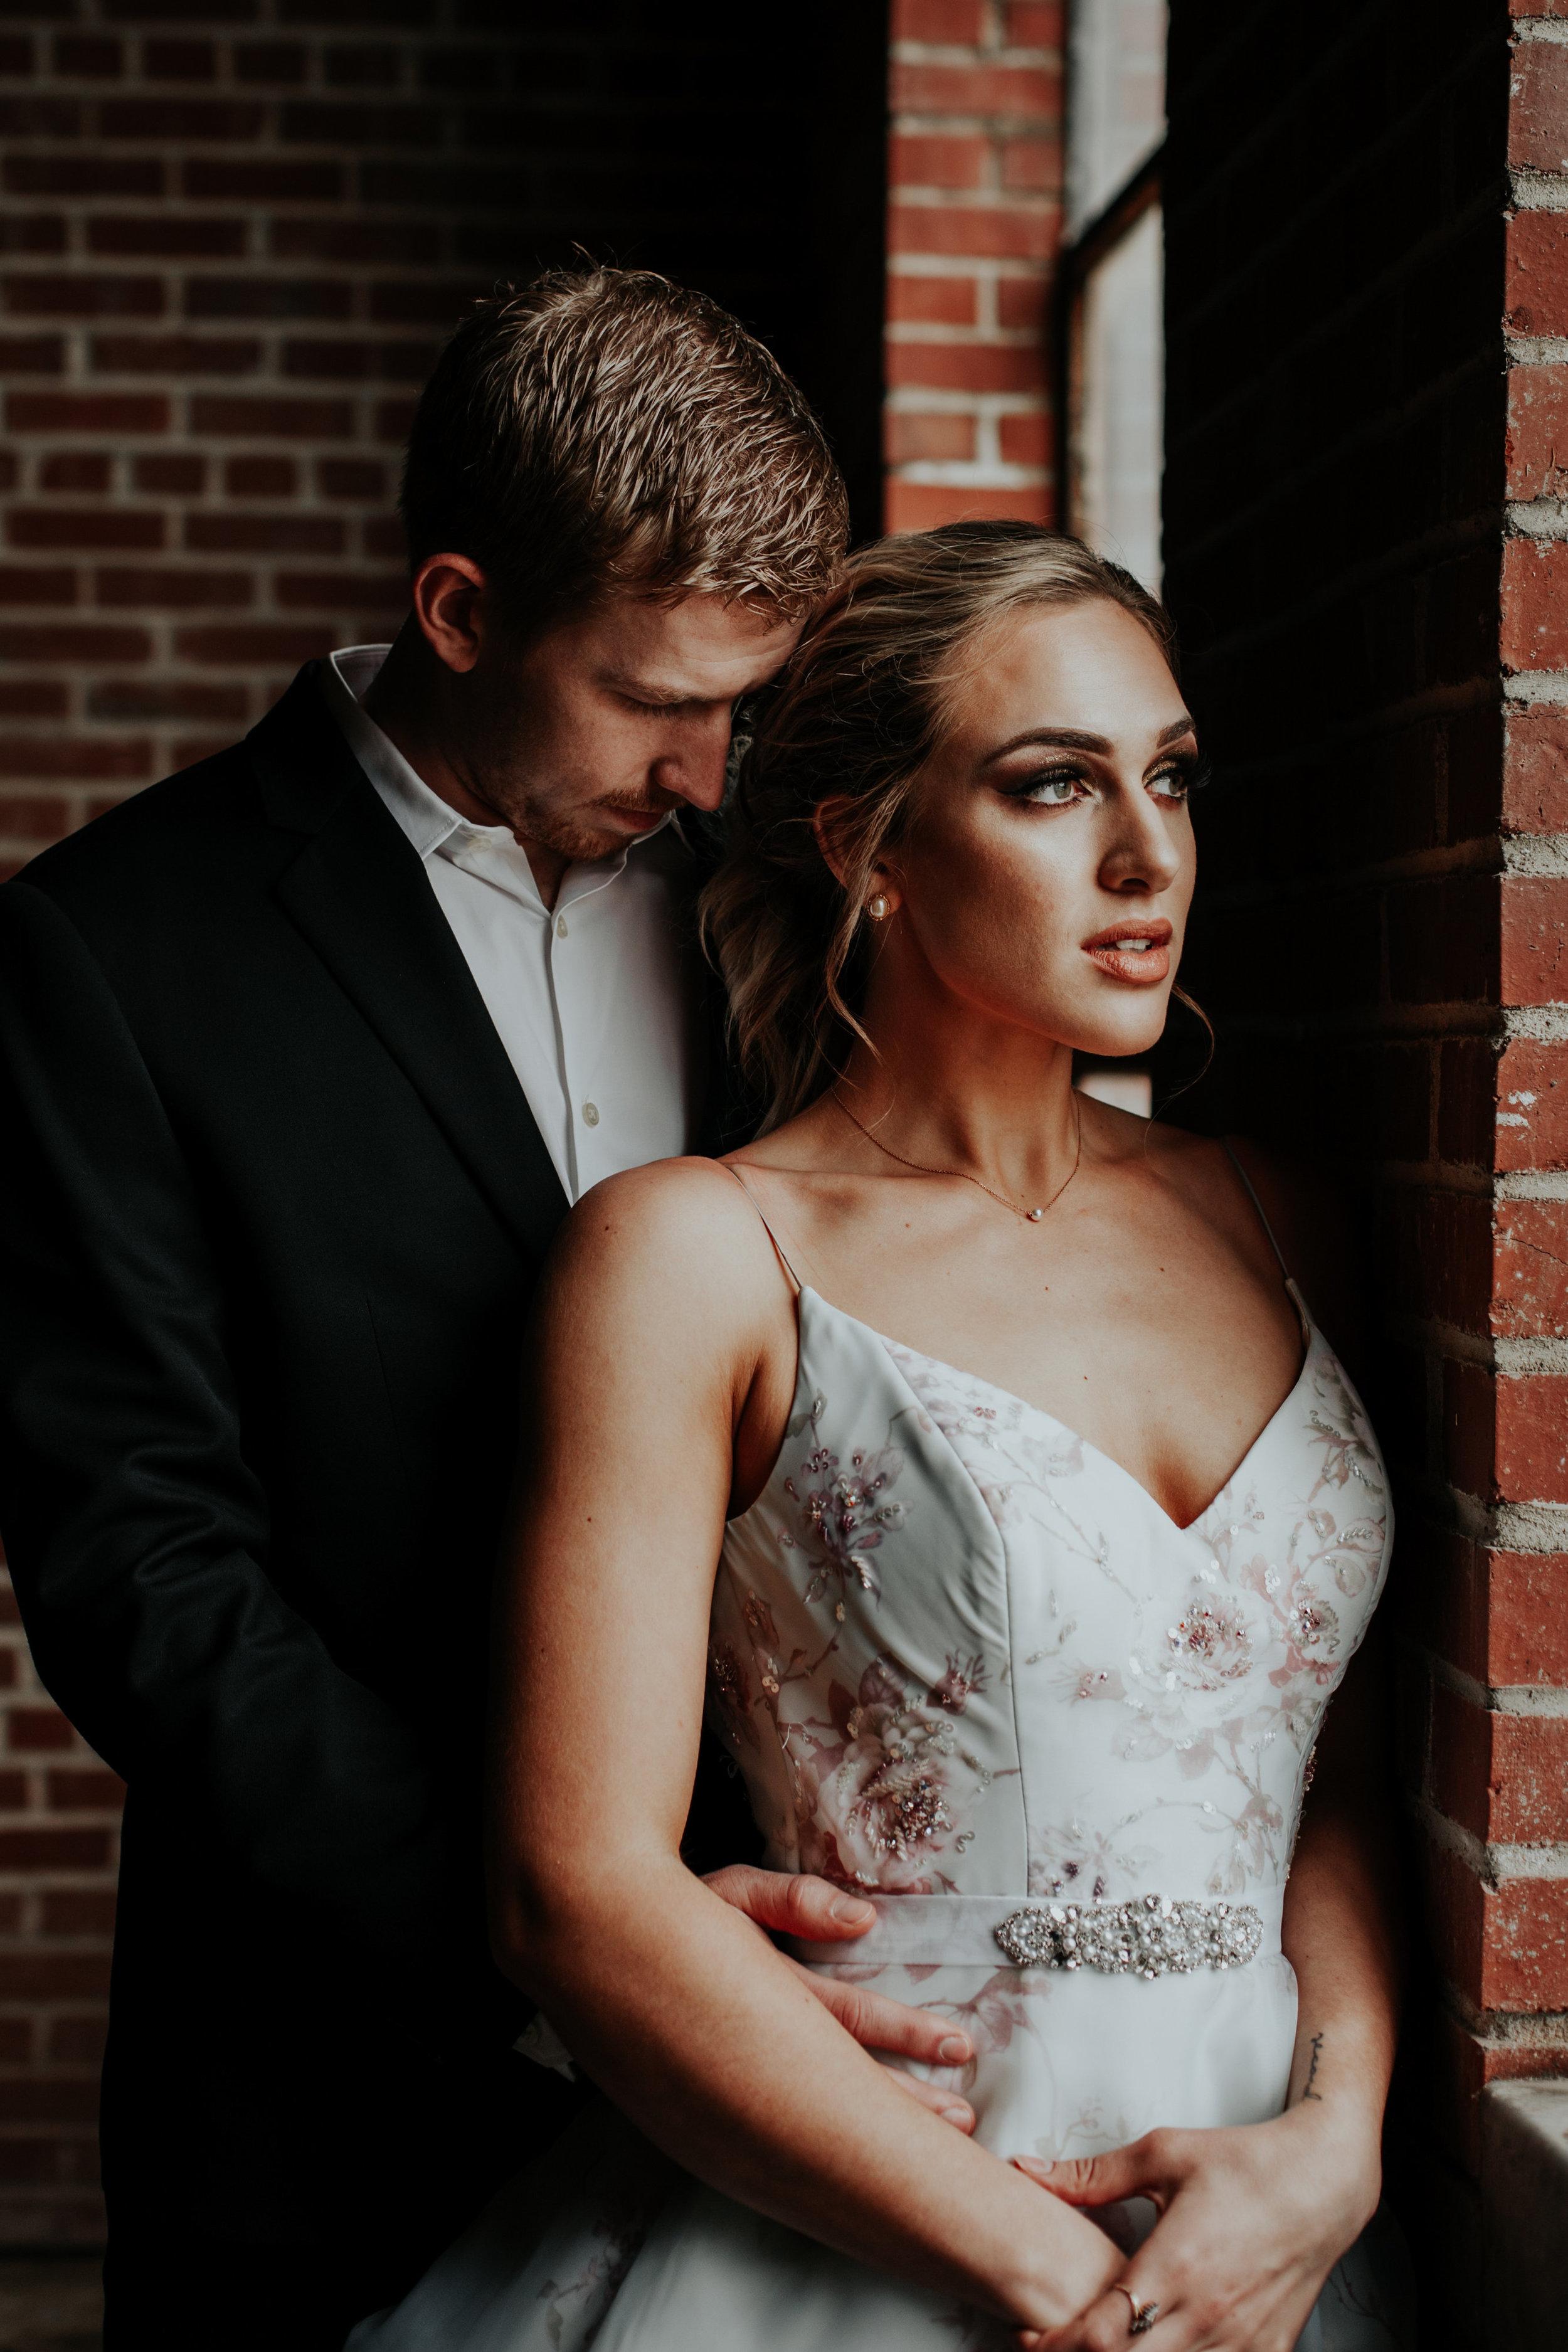 Romantic Industrial Bridal Shoot   Be Images Photography   Wichita, KS